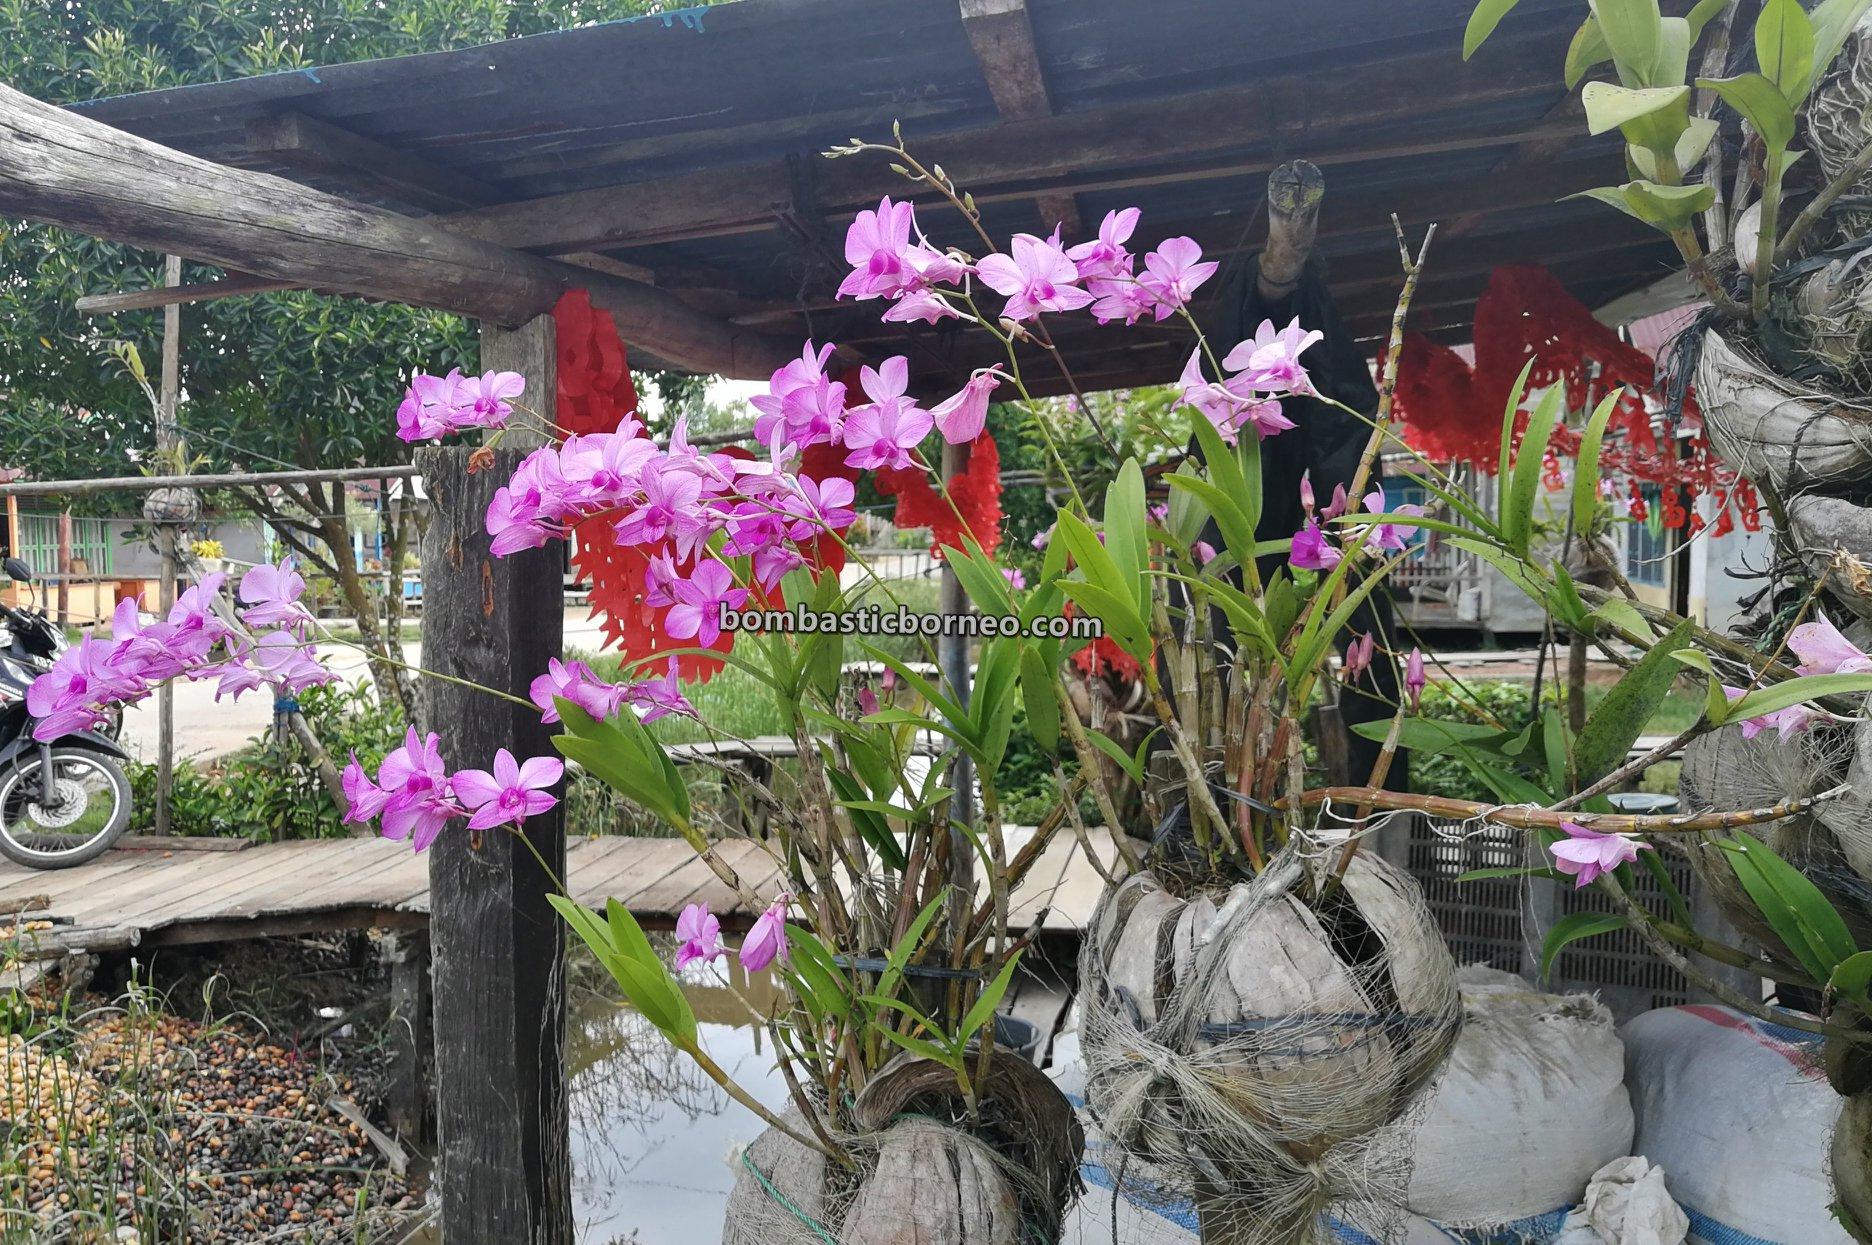 nature, Malay fishing village, Gaya Baru, Tourism, travel guide, Parit Baru, Borneo, 印尼西加里曼丹, 三发文岛宜马来渔村